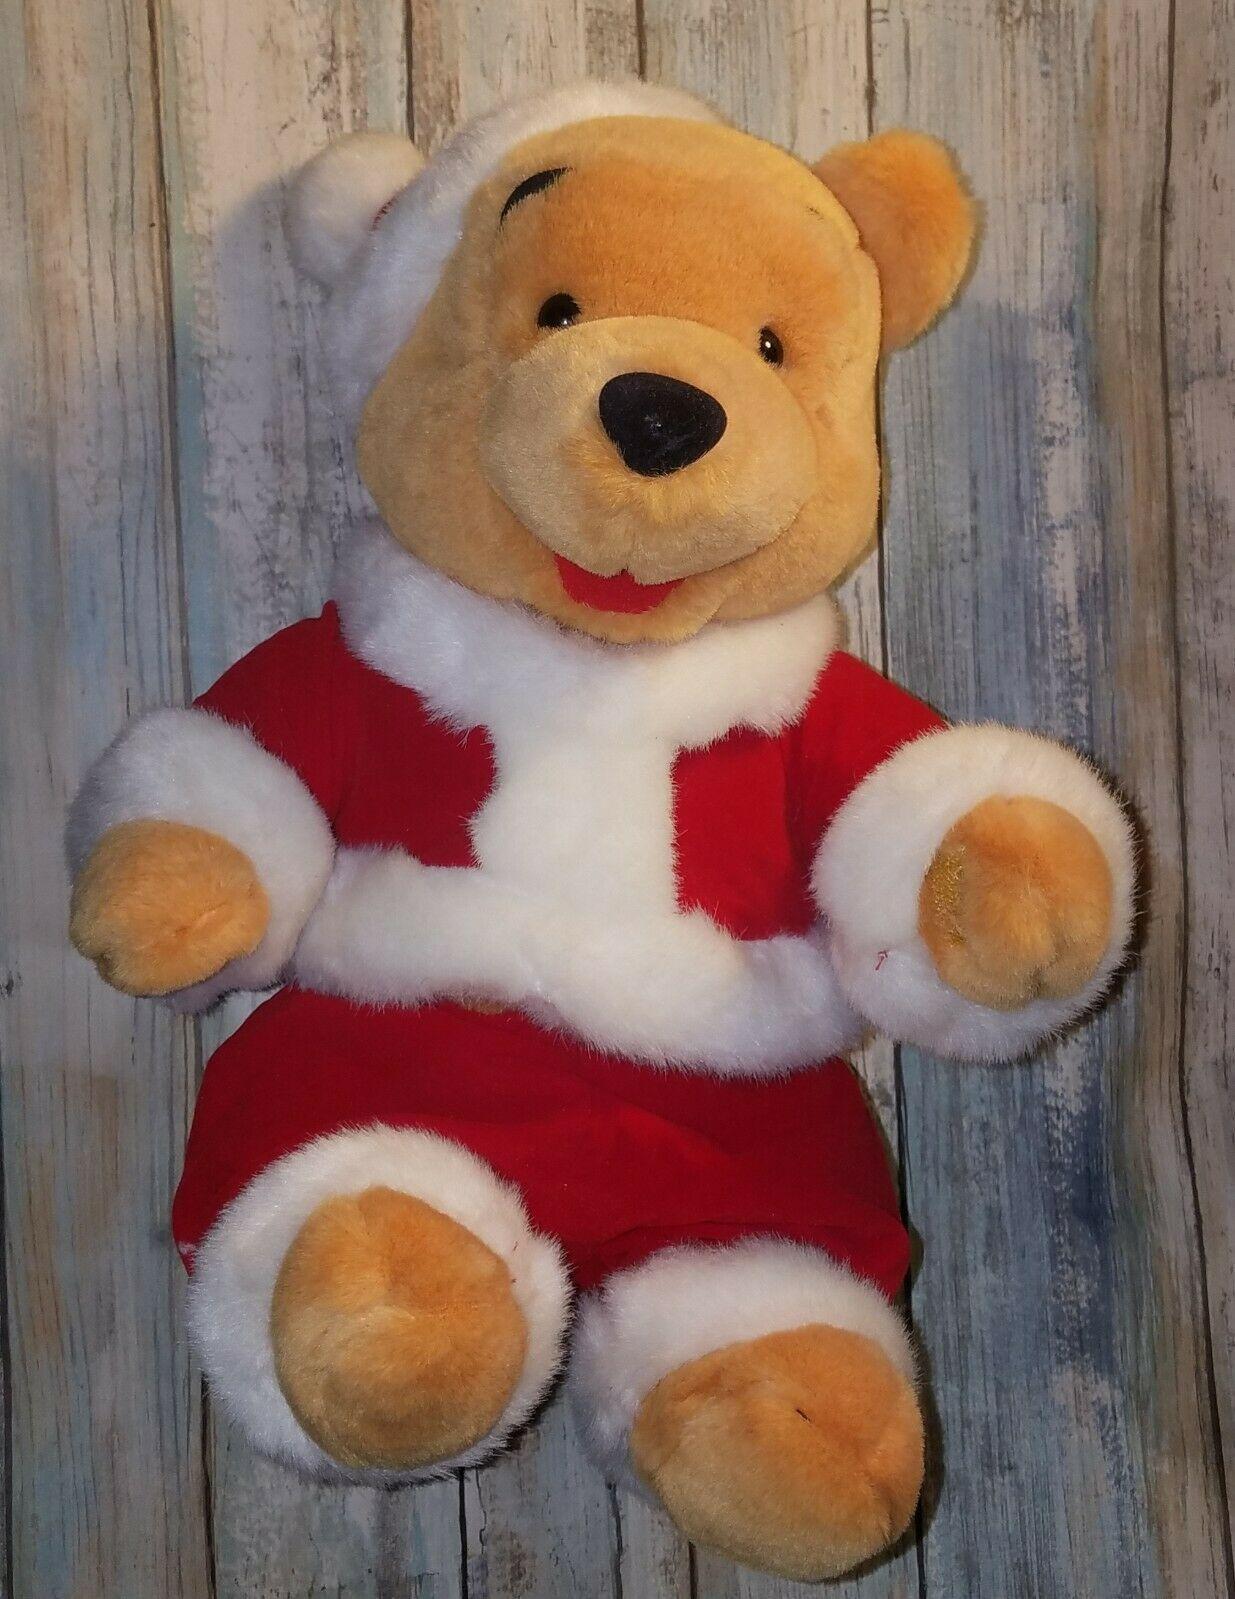 Christmas Winnie The Pooh Wind Up Plush Bear - Wish You A Merry Christmas Disney